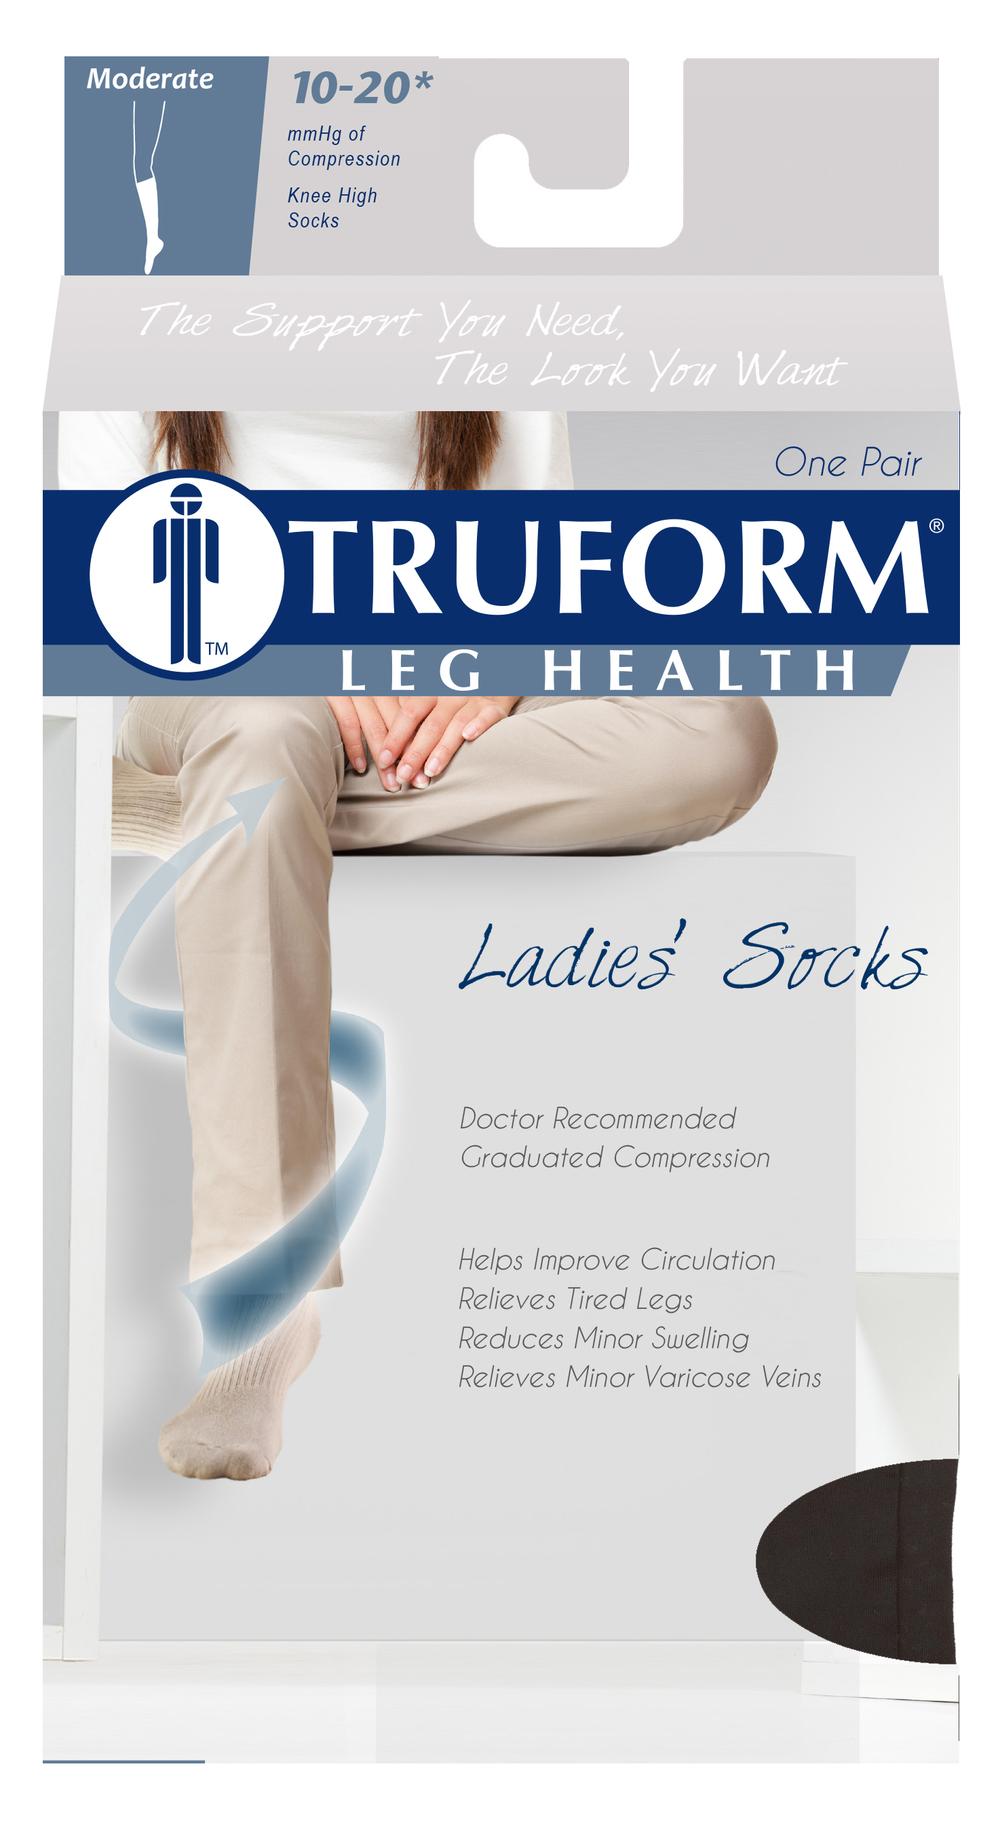 Truform, 1963, Compression, 10-20 mmHg, Women's Calf Length, Package